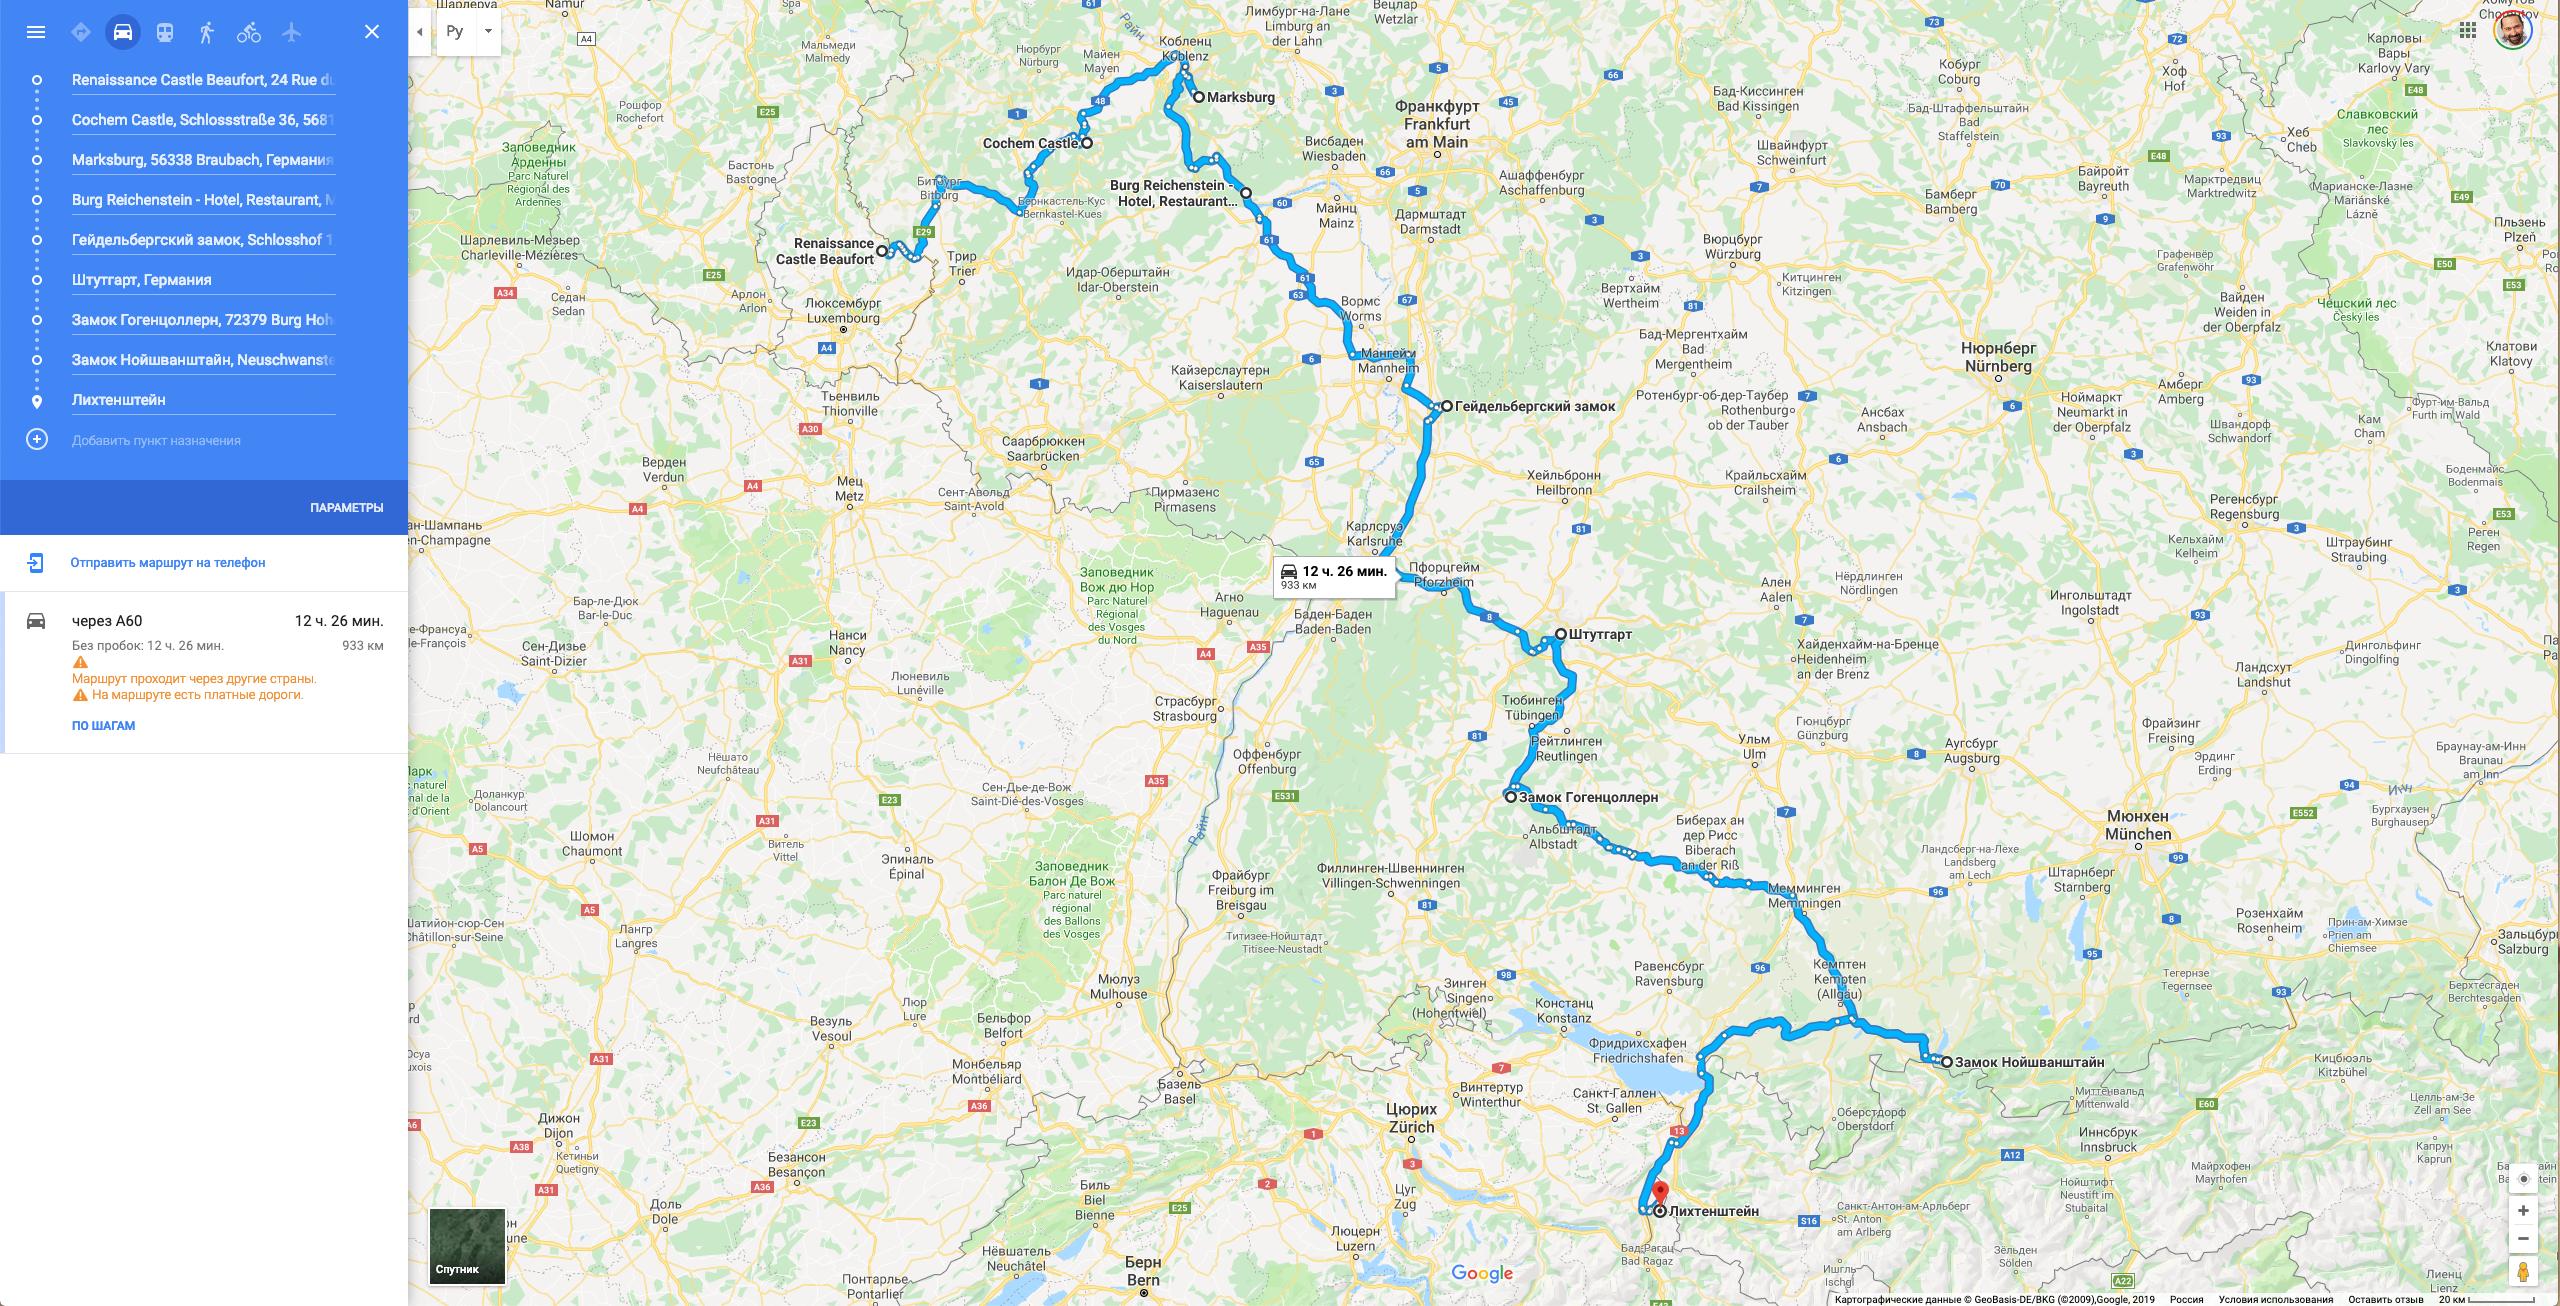 Готовимся кмаршруту Люксембург— Лихтенштейн позамкам Германии